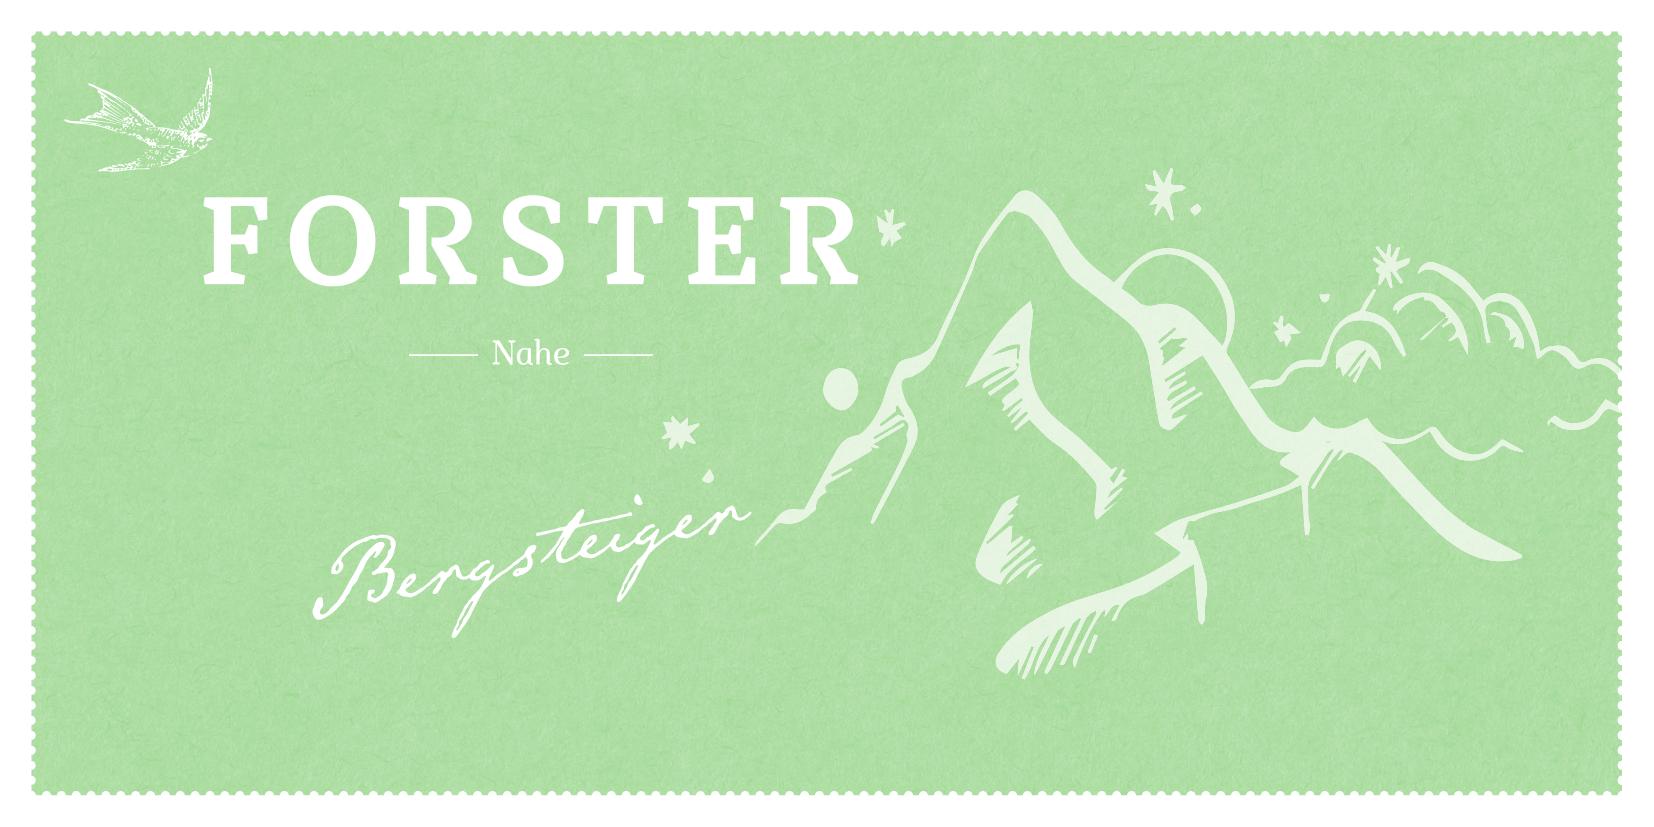 Vorderseite Karte Bergsteiger.png